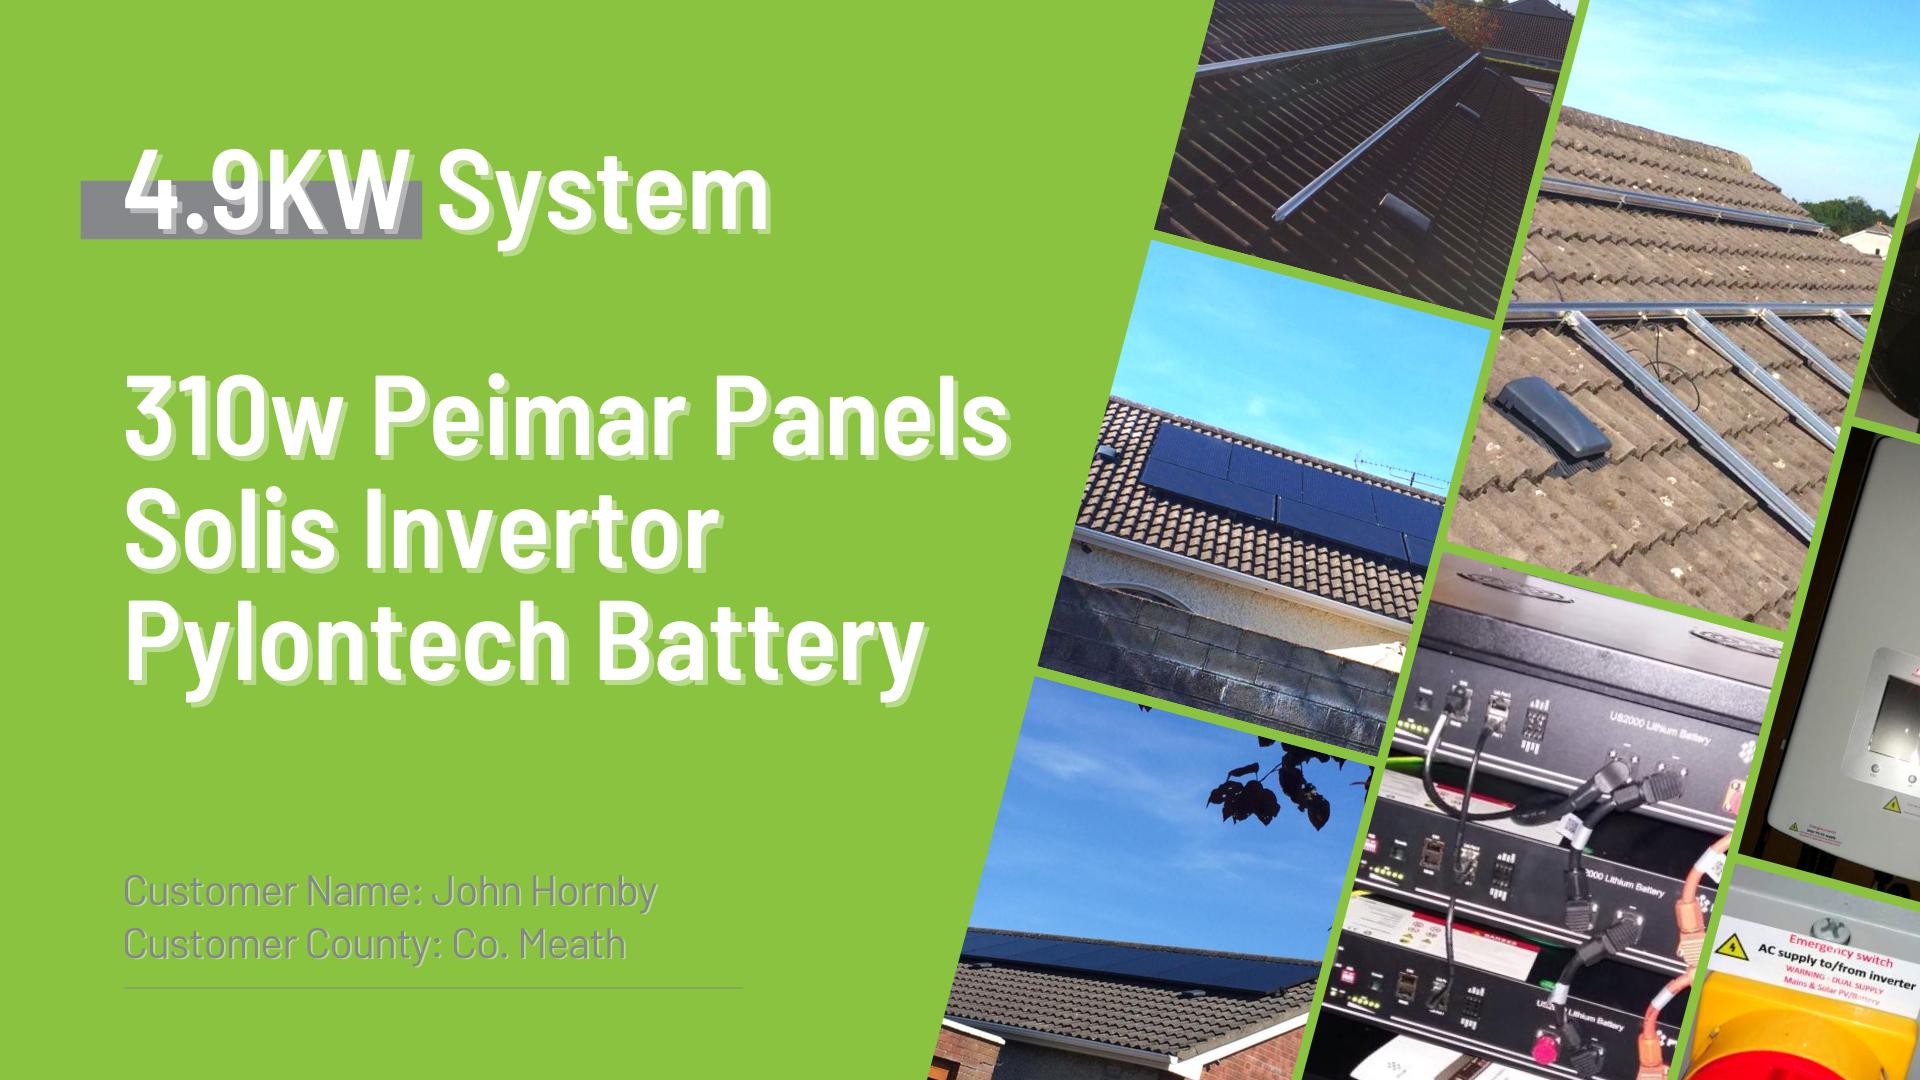 Case Study - Solar Panel Install Co. Meath - NRG Panel - #1